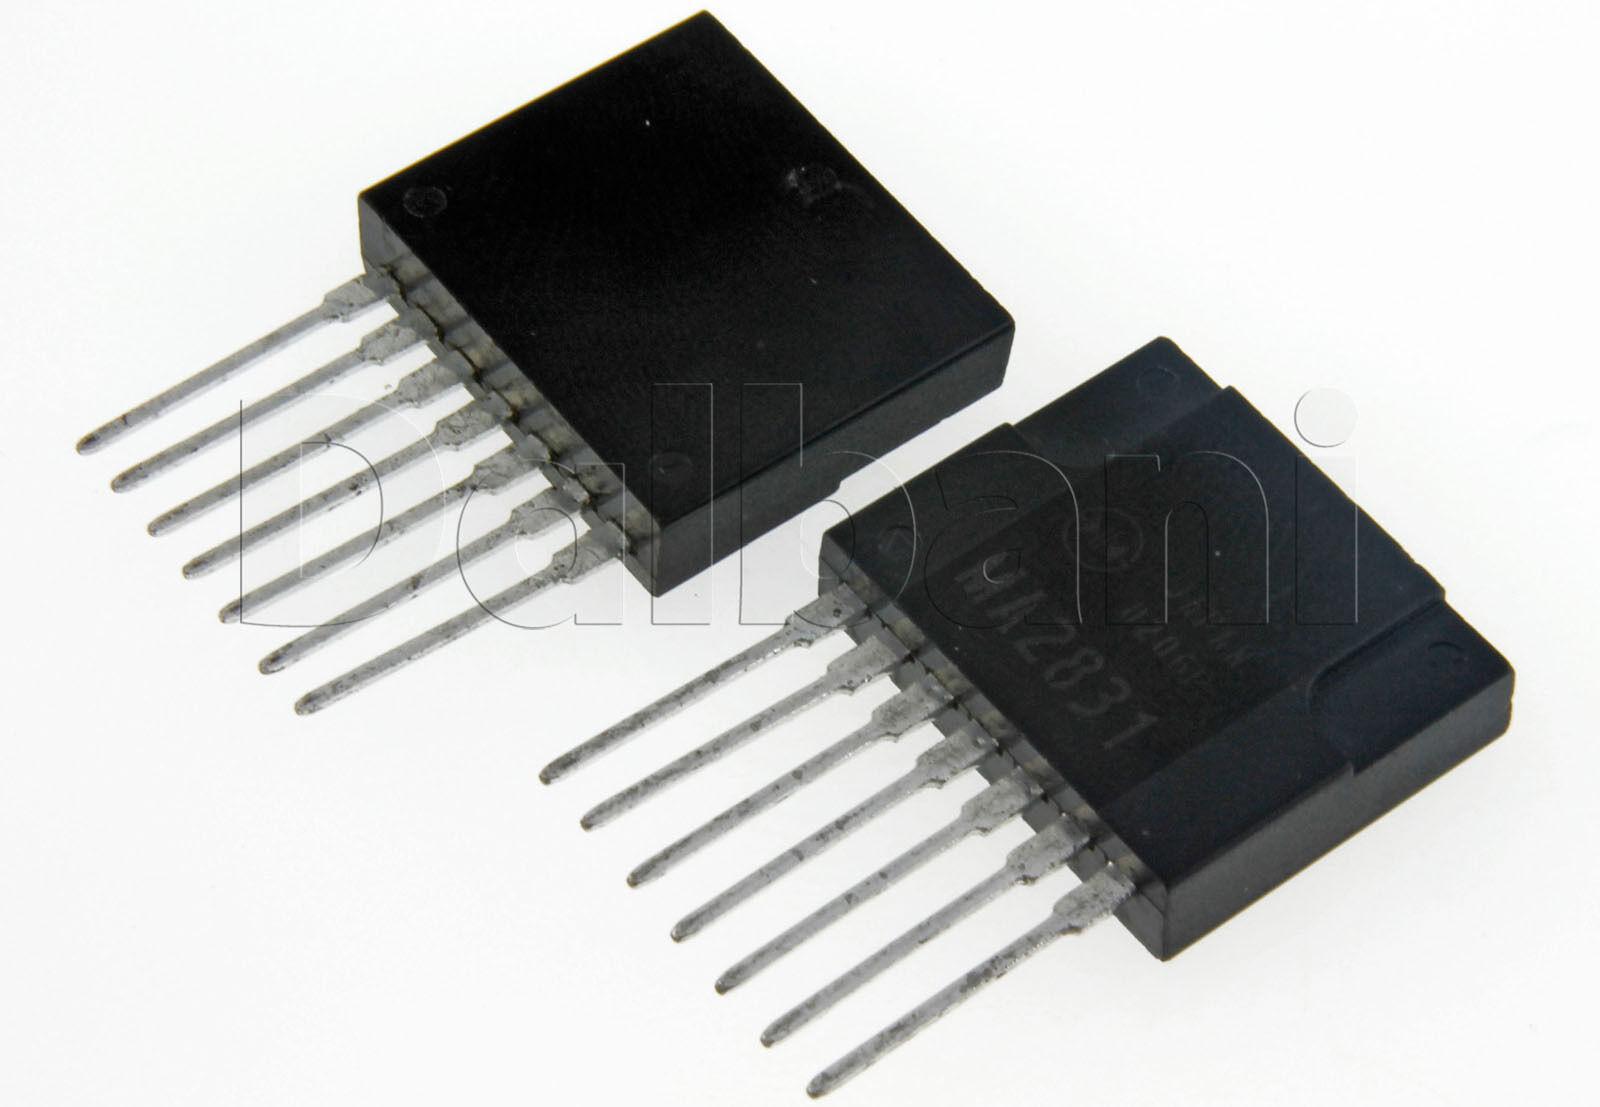 Ma2831 Original Pulled Shindengen Integrated Circuit Ebay Ic Ne555 Ne555p 555 Dip 8 Timers New High Quality